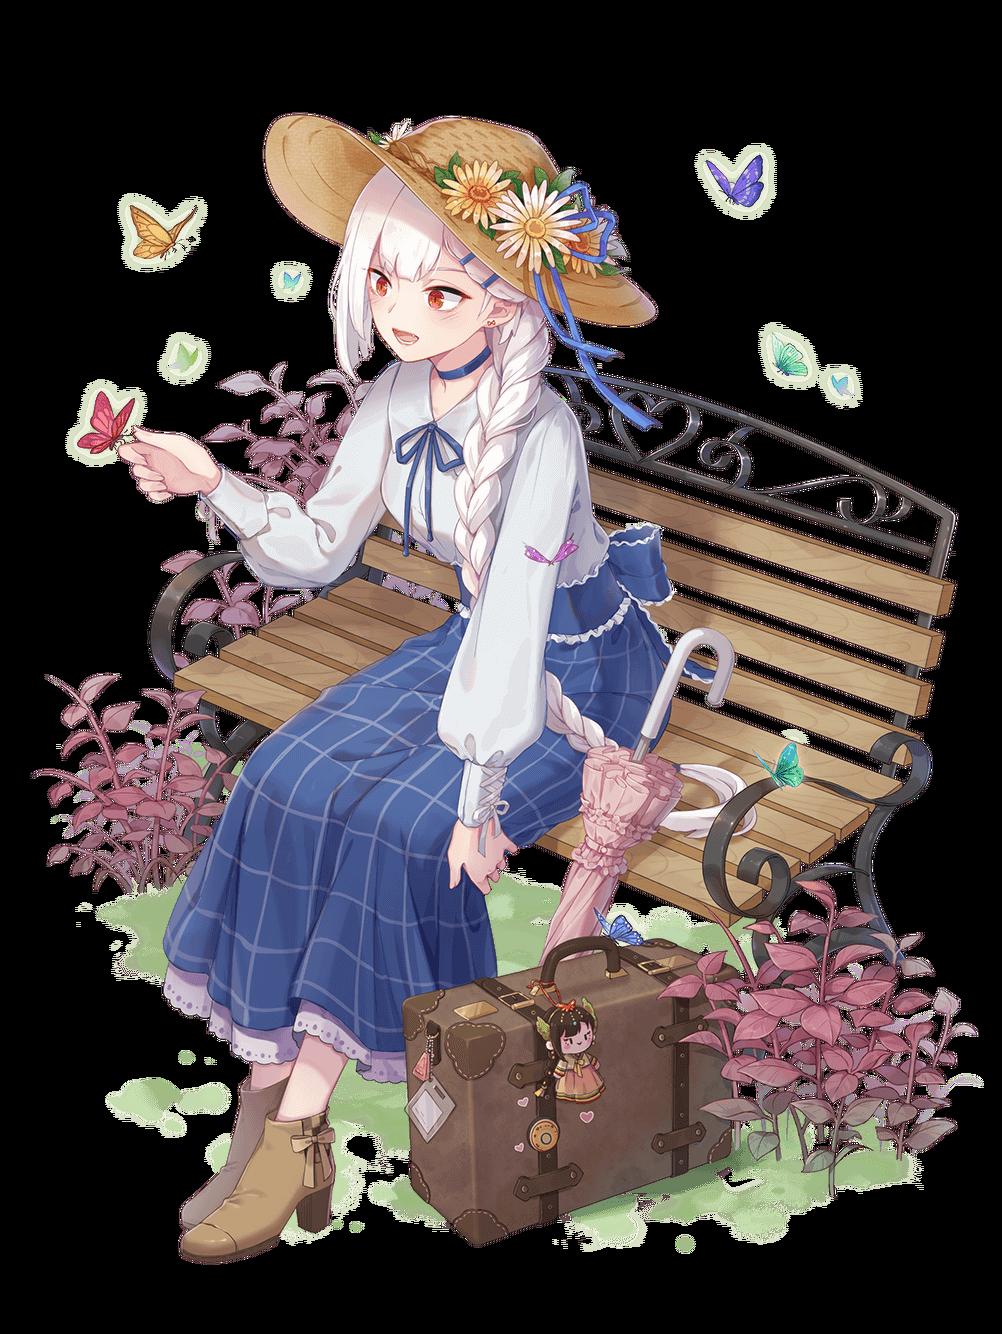 Skin-Ddeokbokki-Butterfly Spring.png